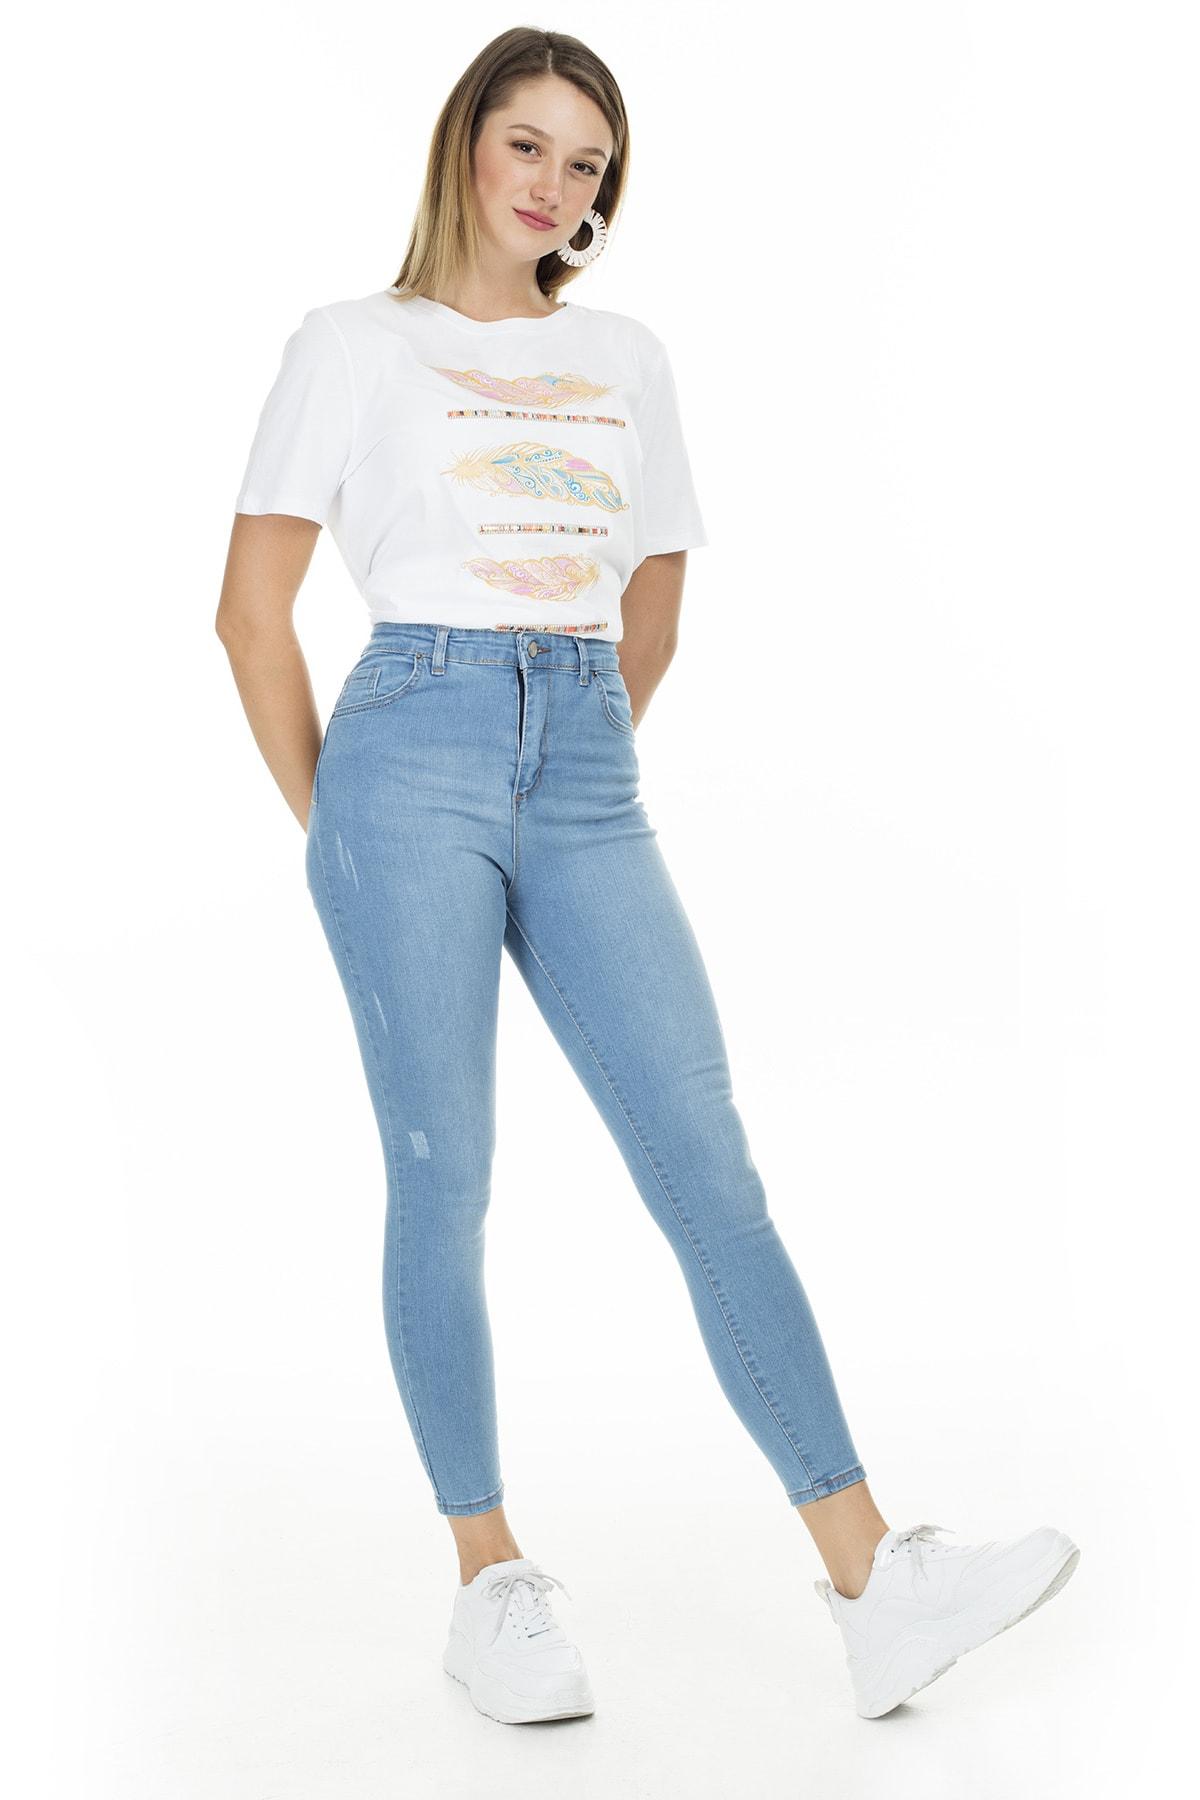 Lela Yüksek Bel Skinny Pamuklu Jeans KADIN KOT PANTOLON 58713261